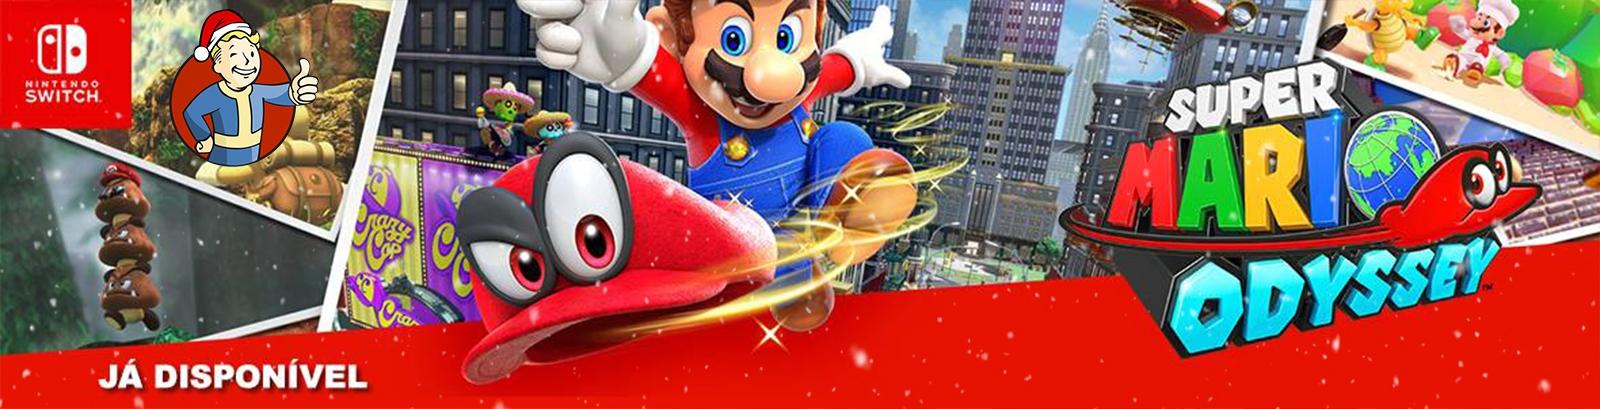 Super Mario Odyssey - Já Disponível